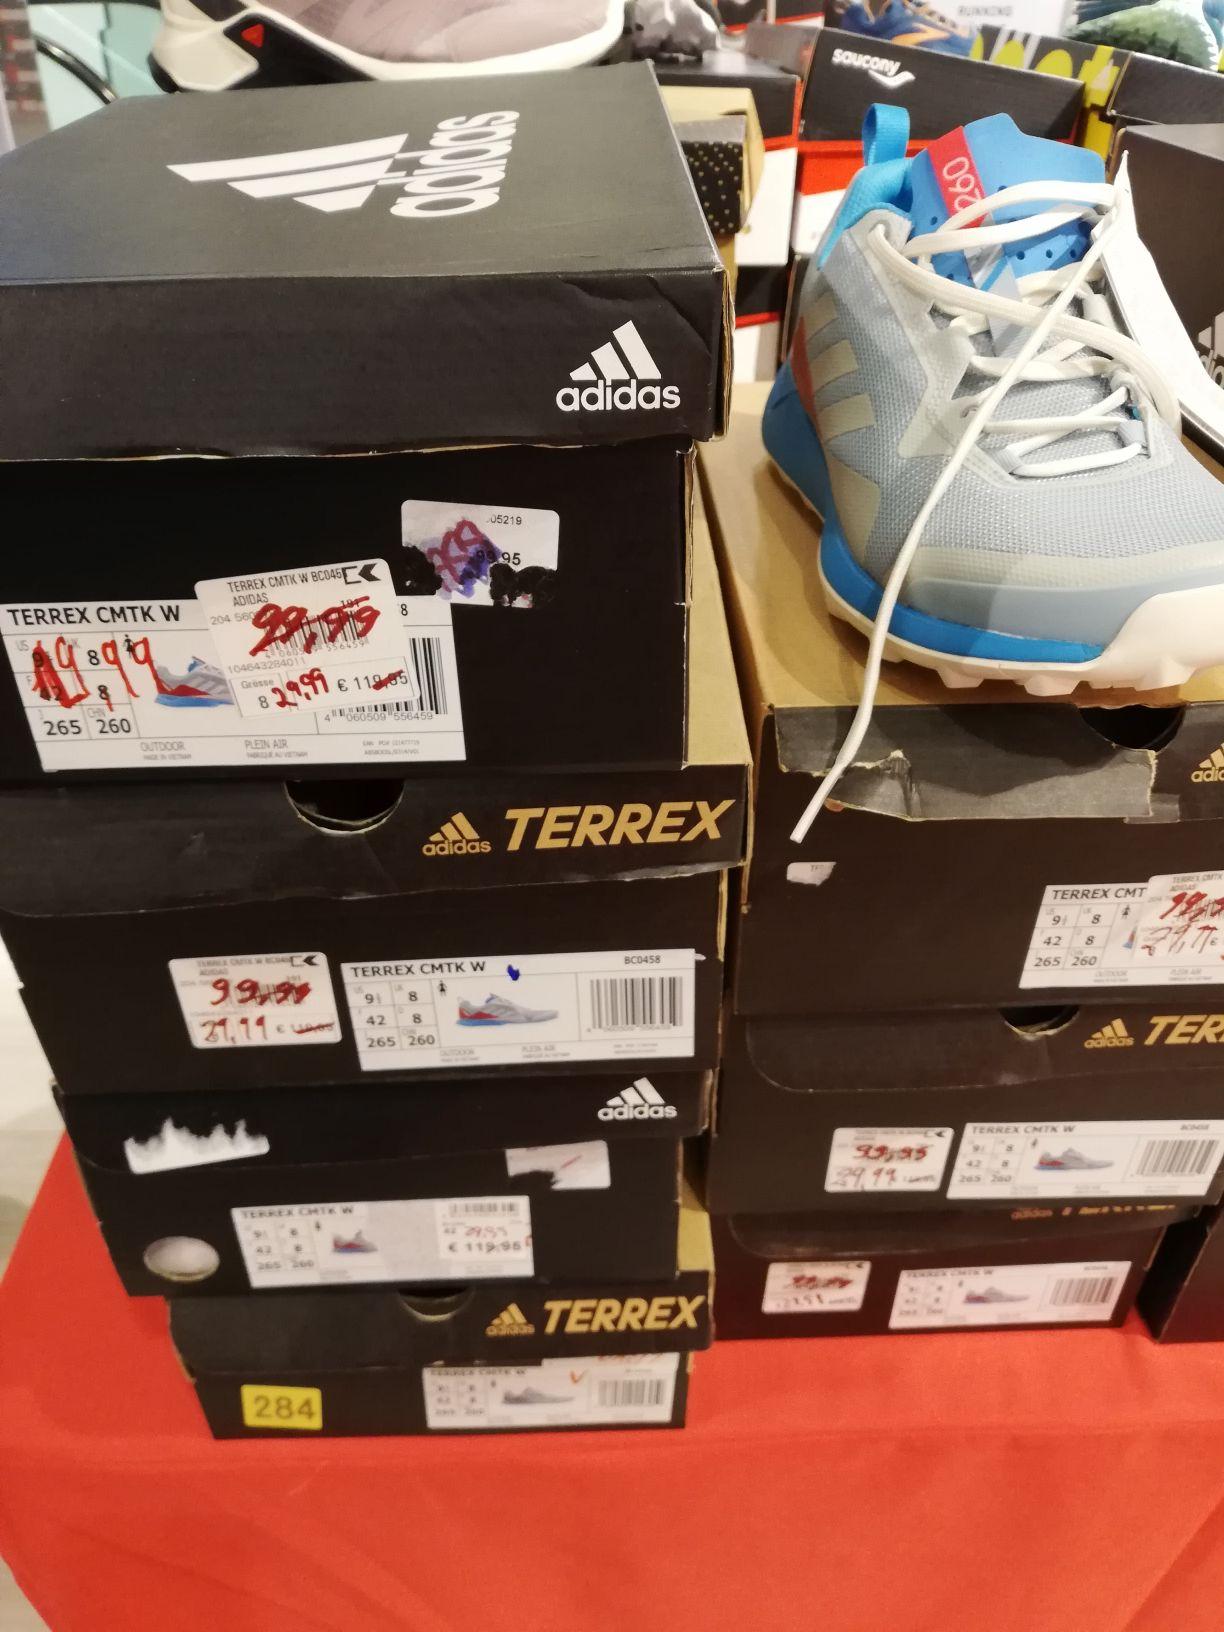 Lokal - Karstadt Sport in Hannover - Adidas Terrex CMTK W Trailrunning-Schuhe